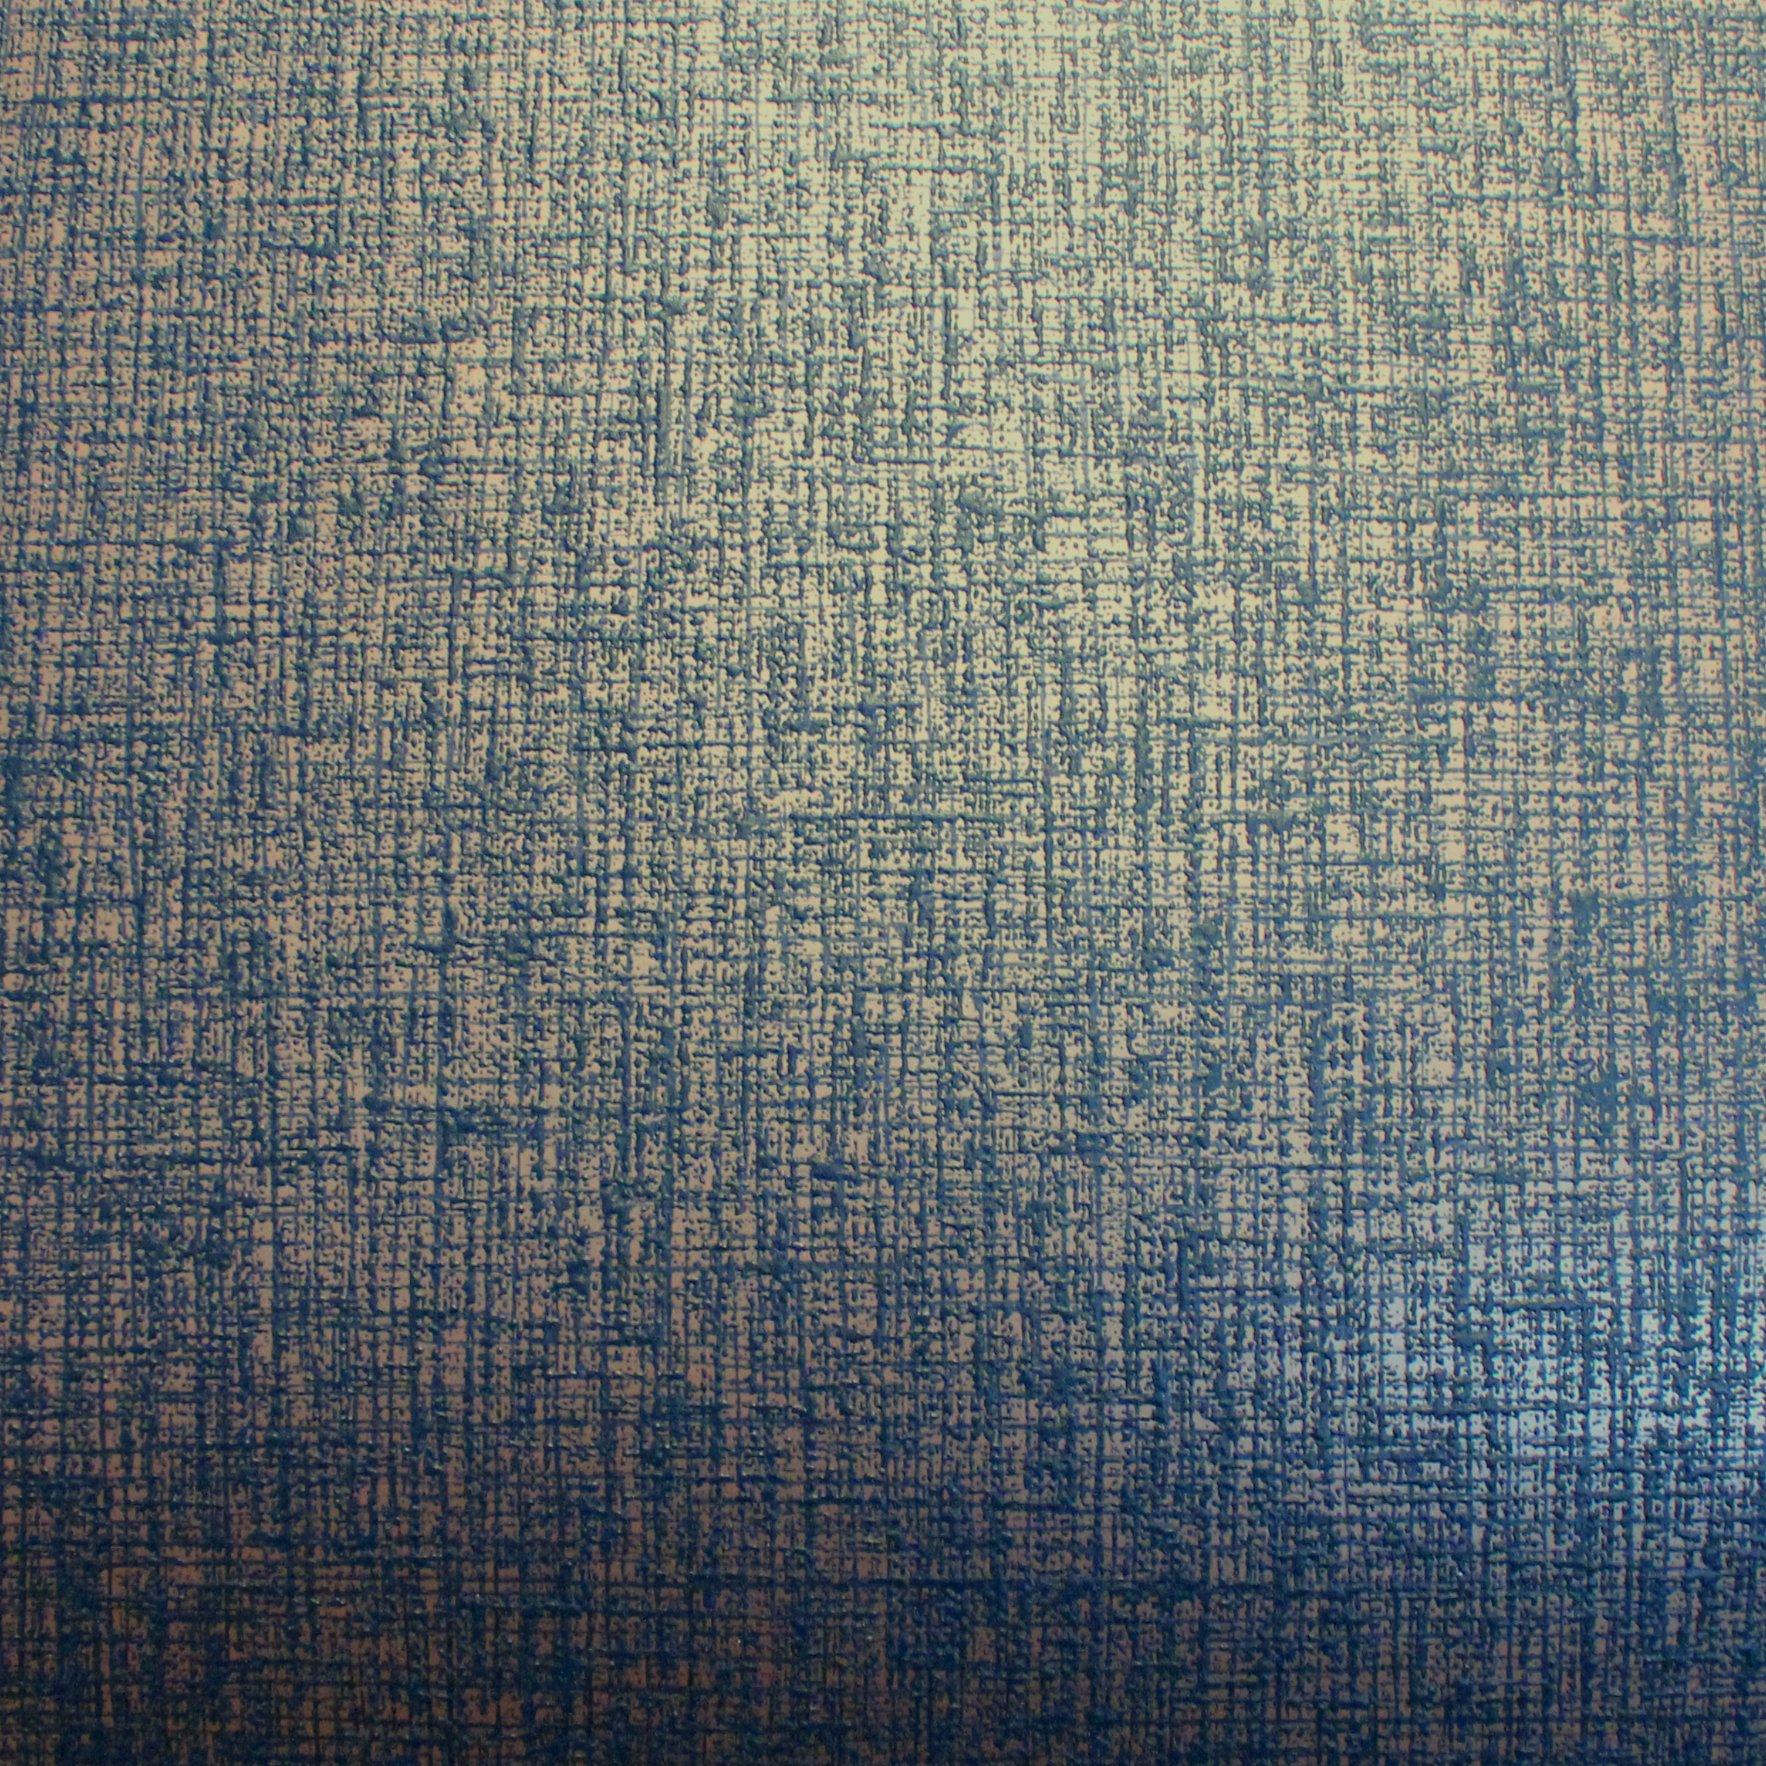 Kashmir Texture Navygold Arthouse Luxe 910304 Wallpaper